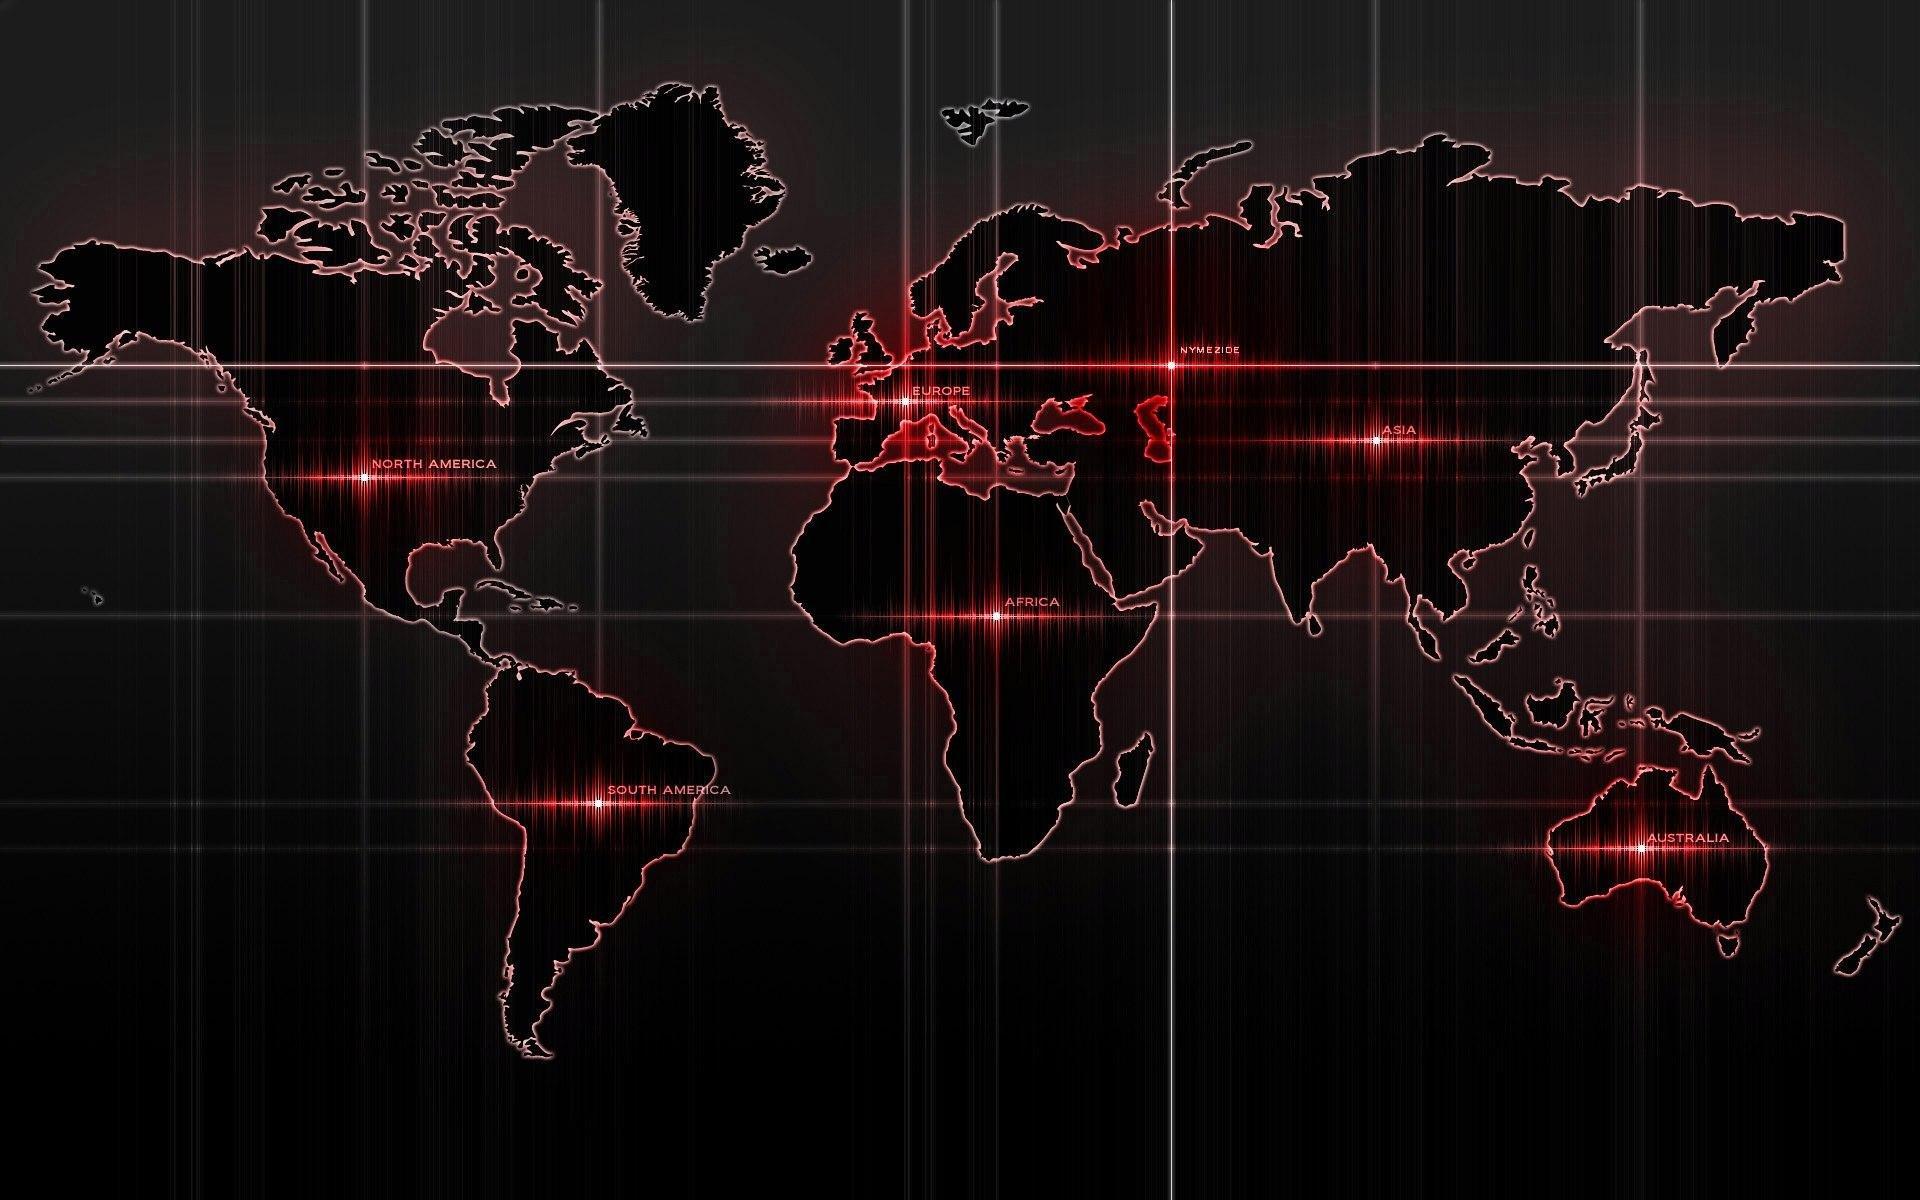 Intelligence Agency crime usa america spy logo wallpaper background 1920x1200